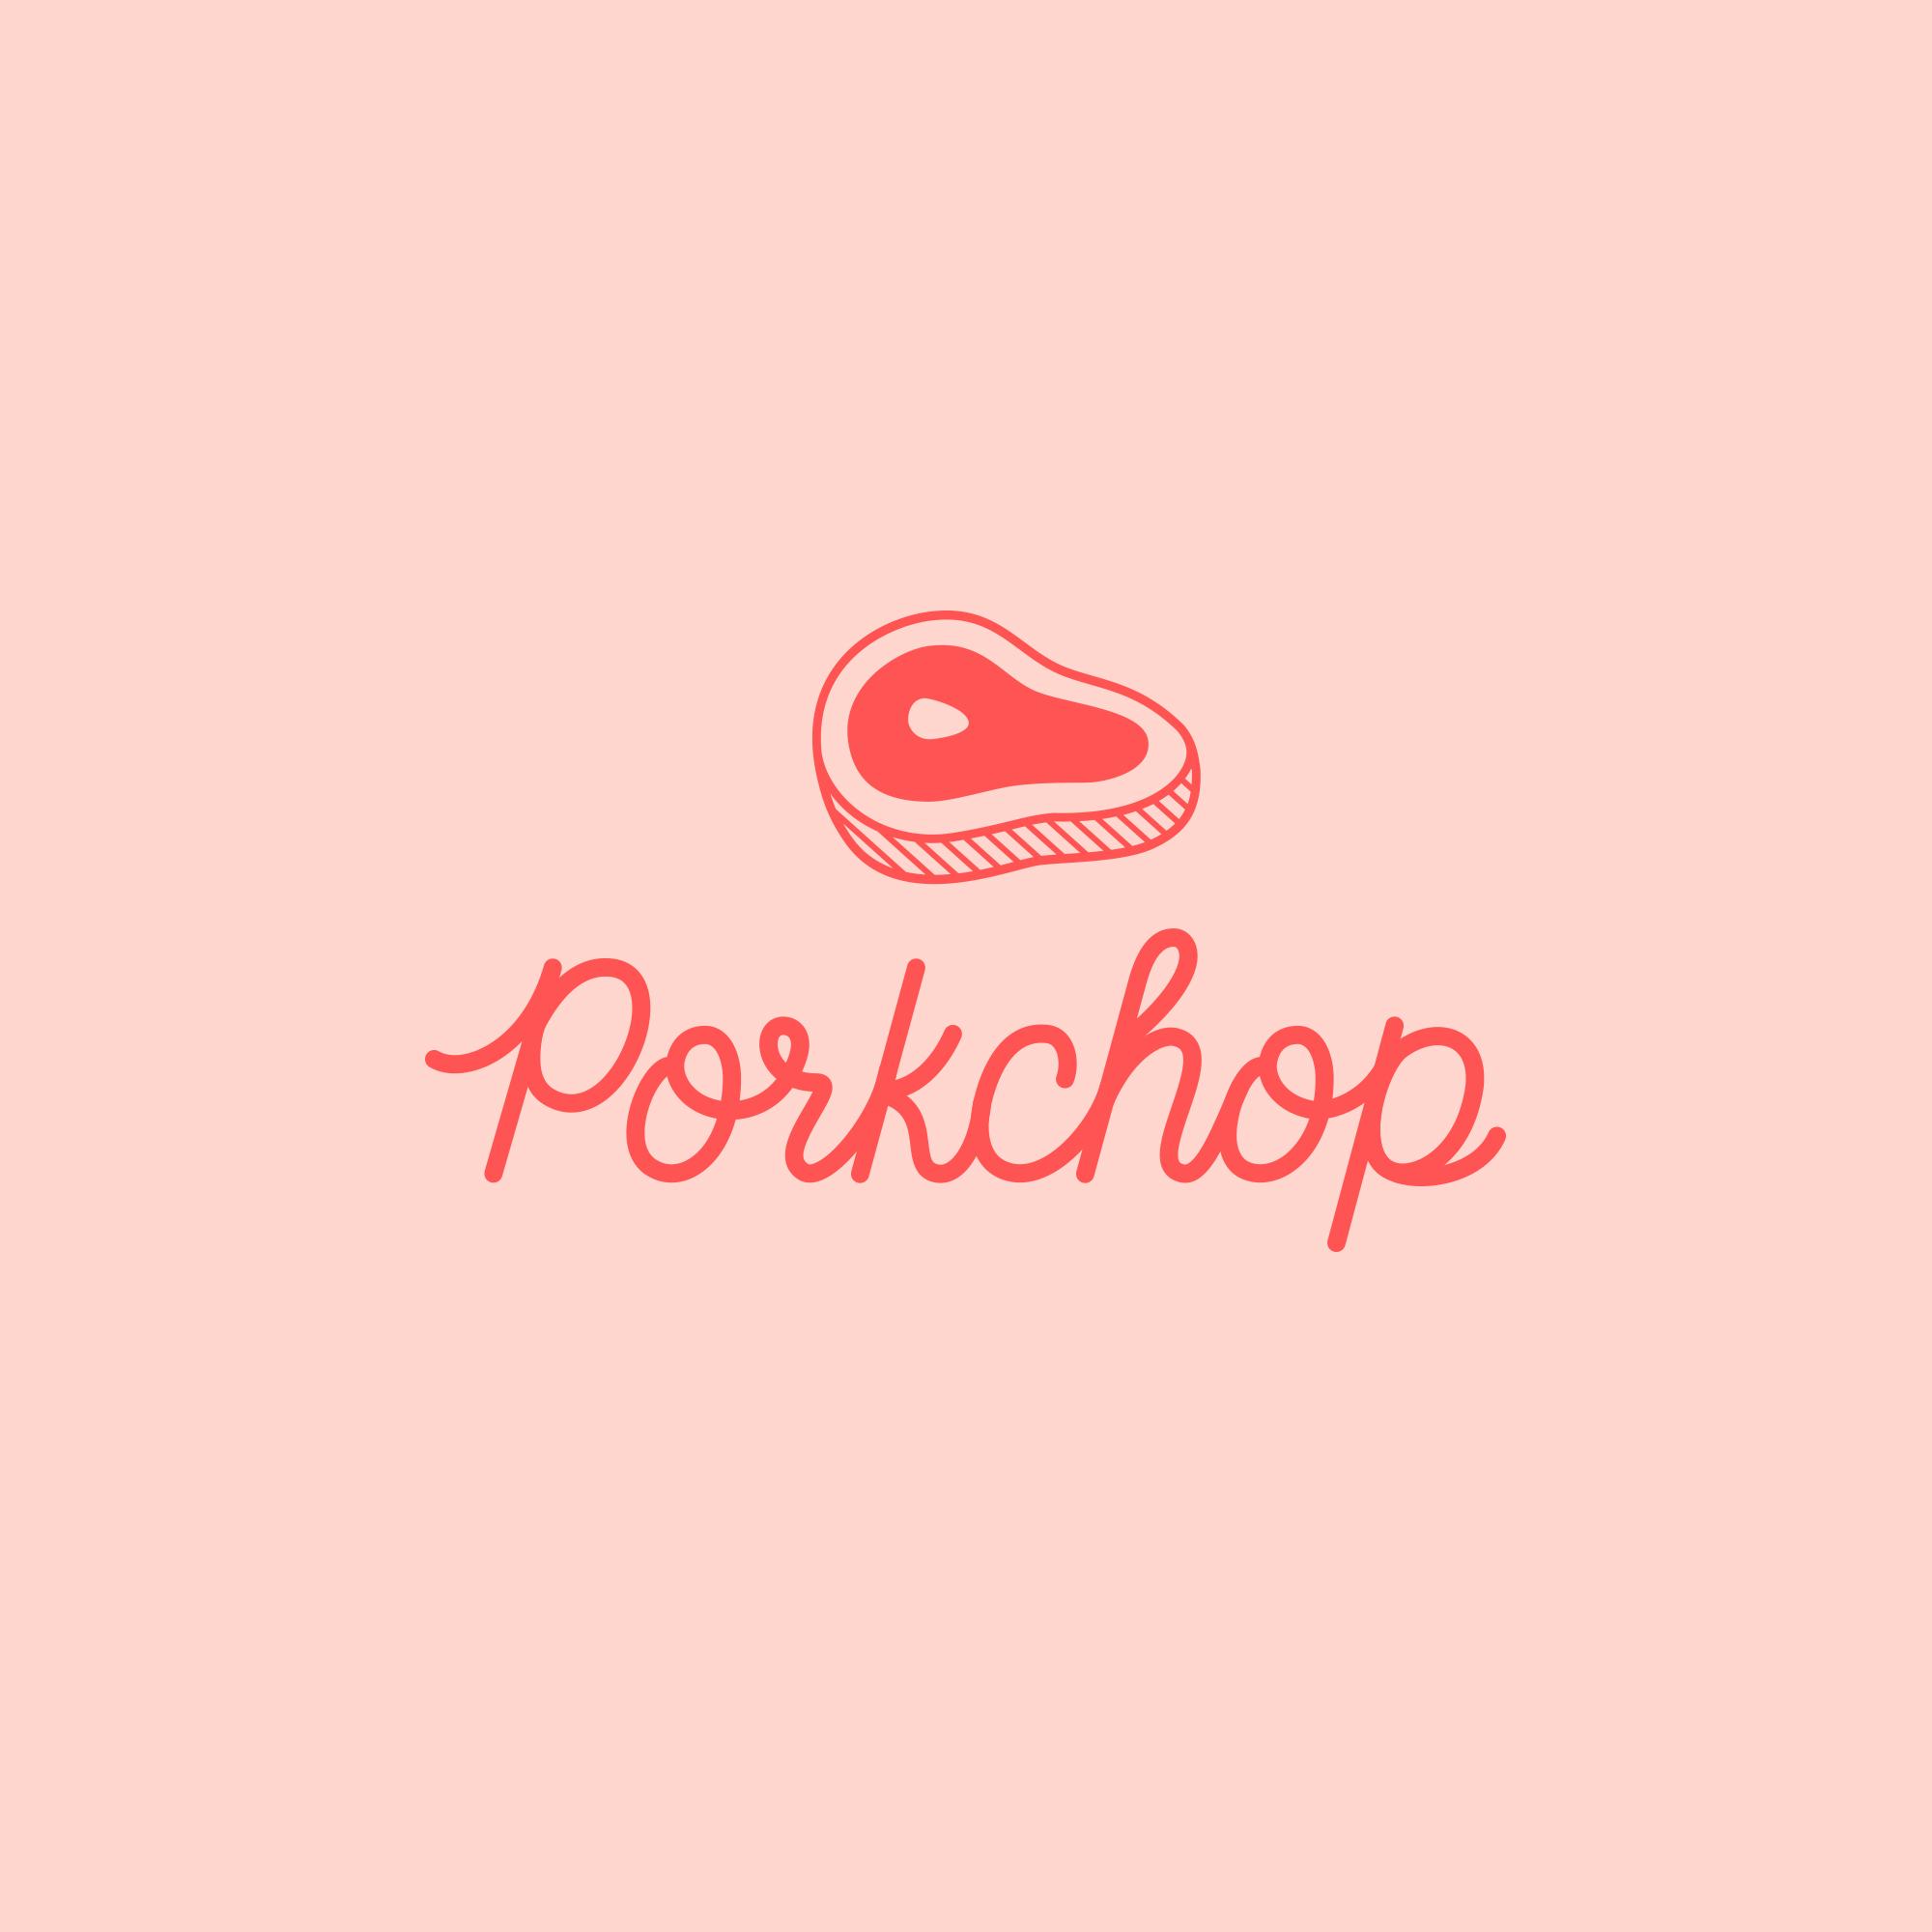 MS-porkchop-logo.jpg